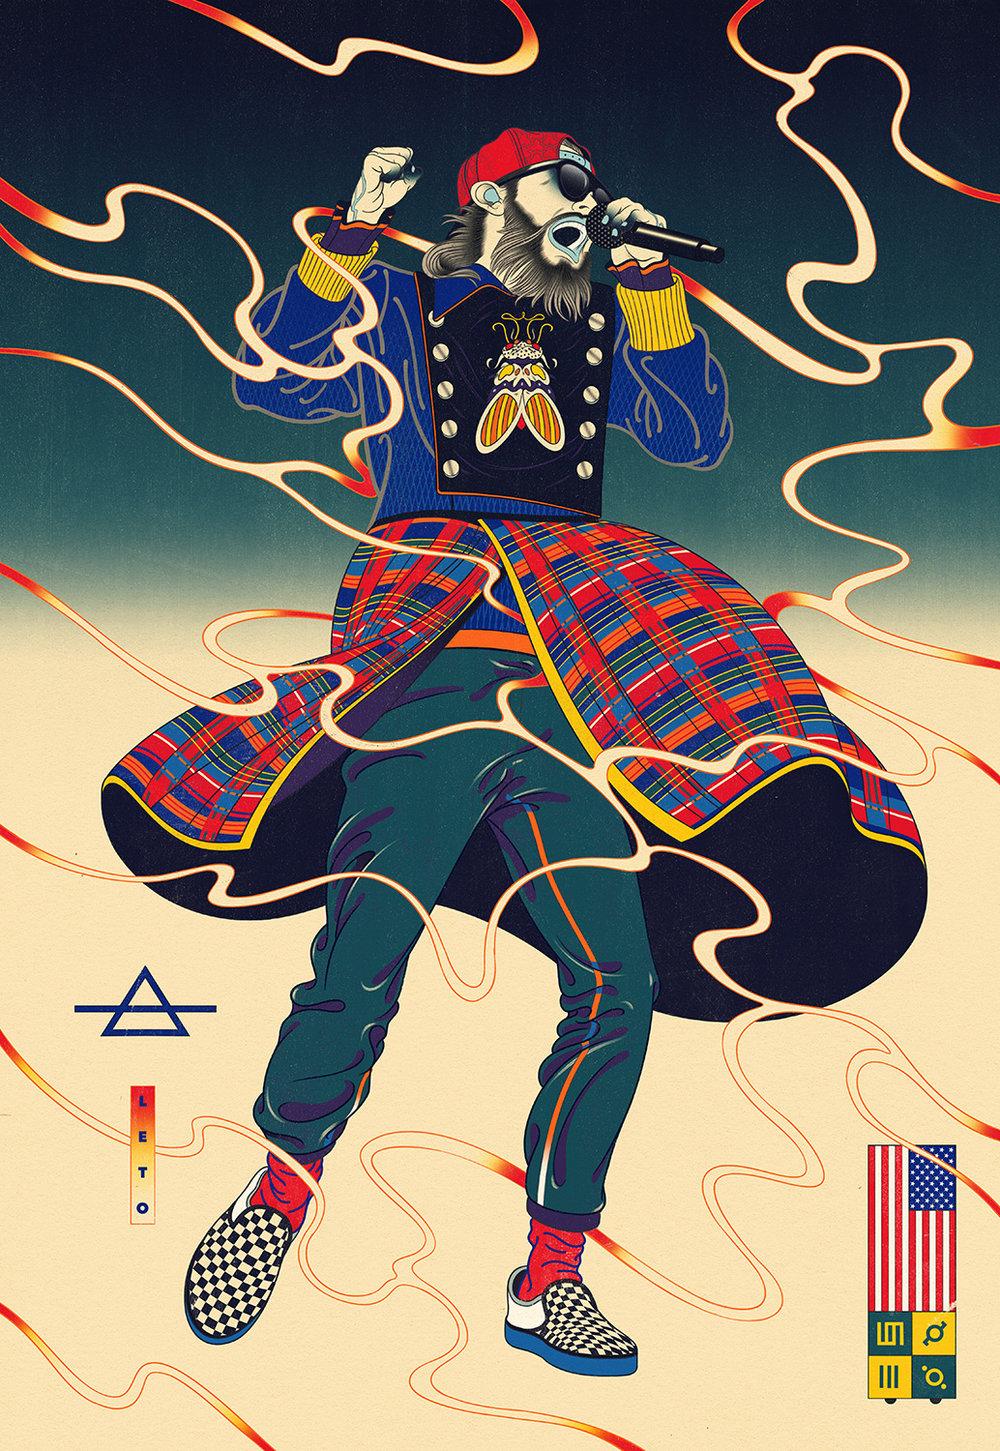 Jared Leto — 30 Seconds To Mars Artwork